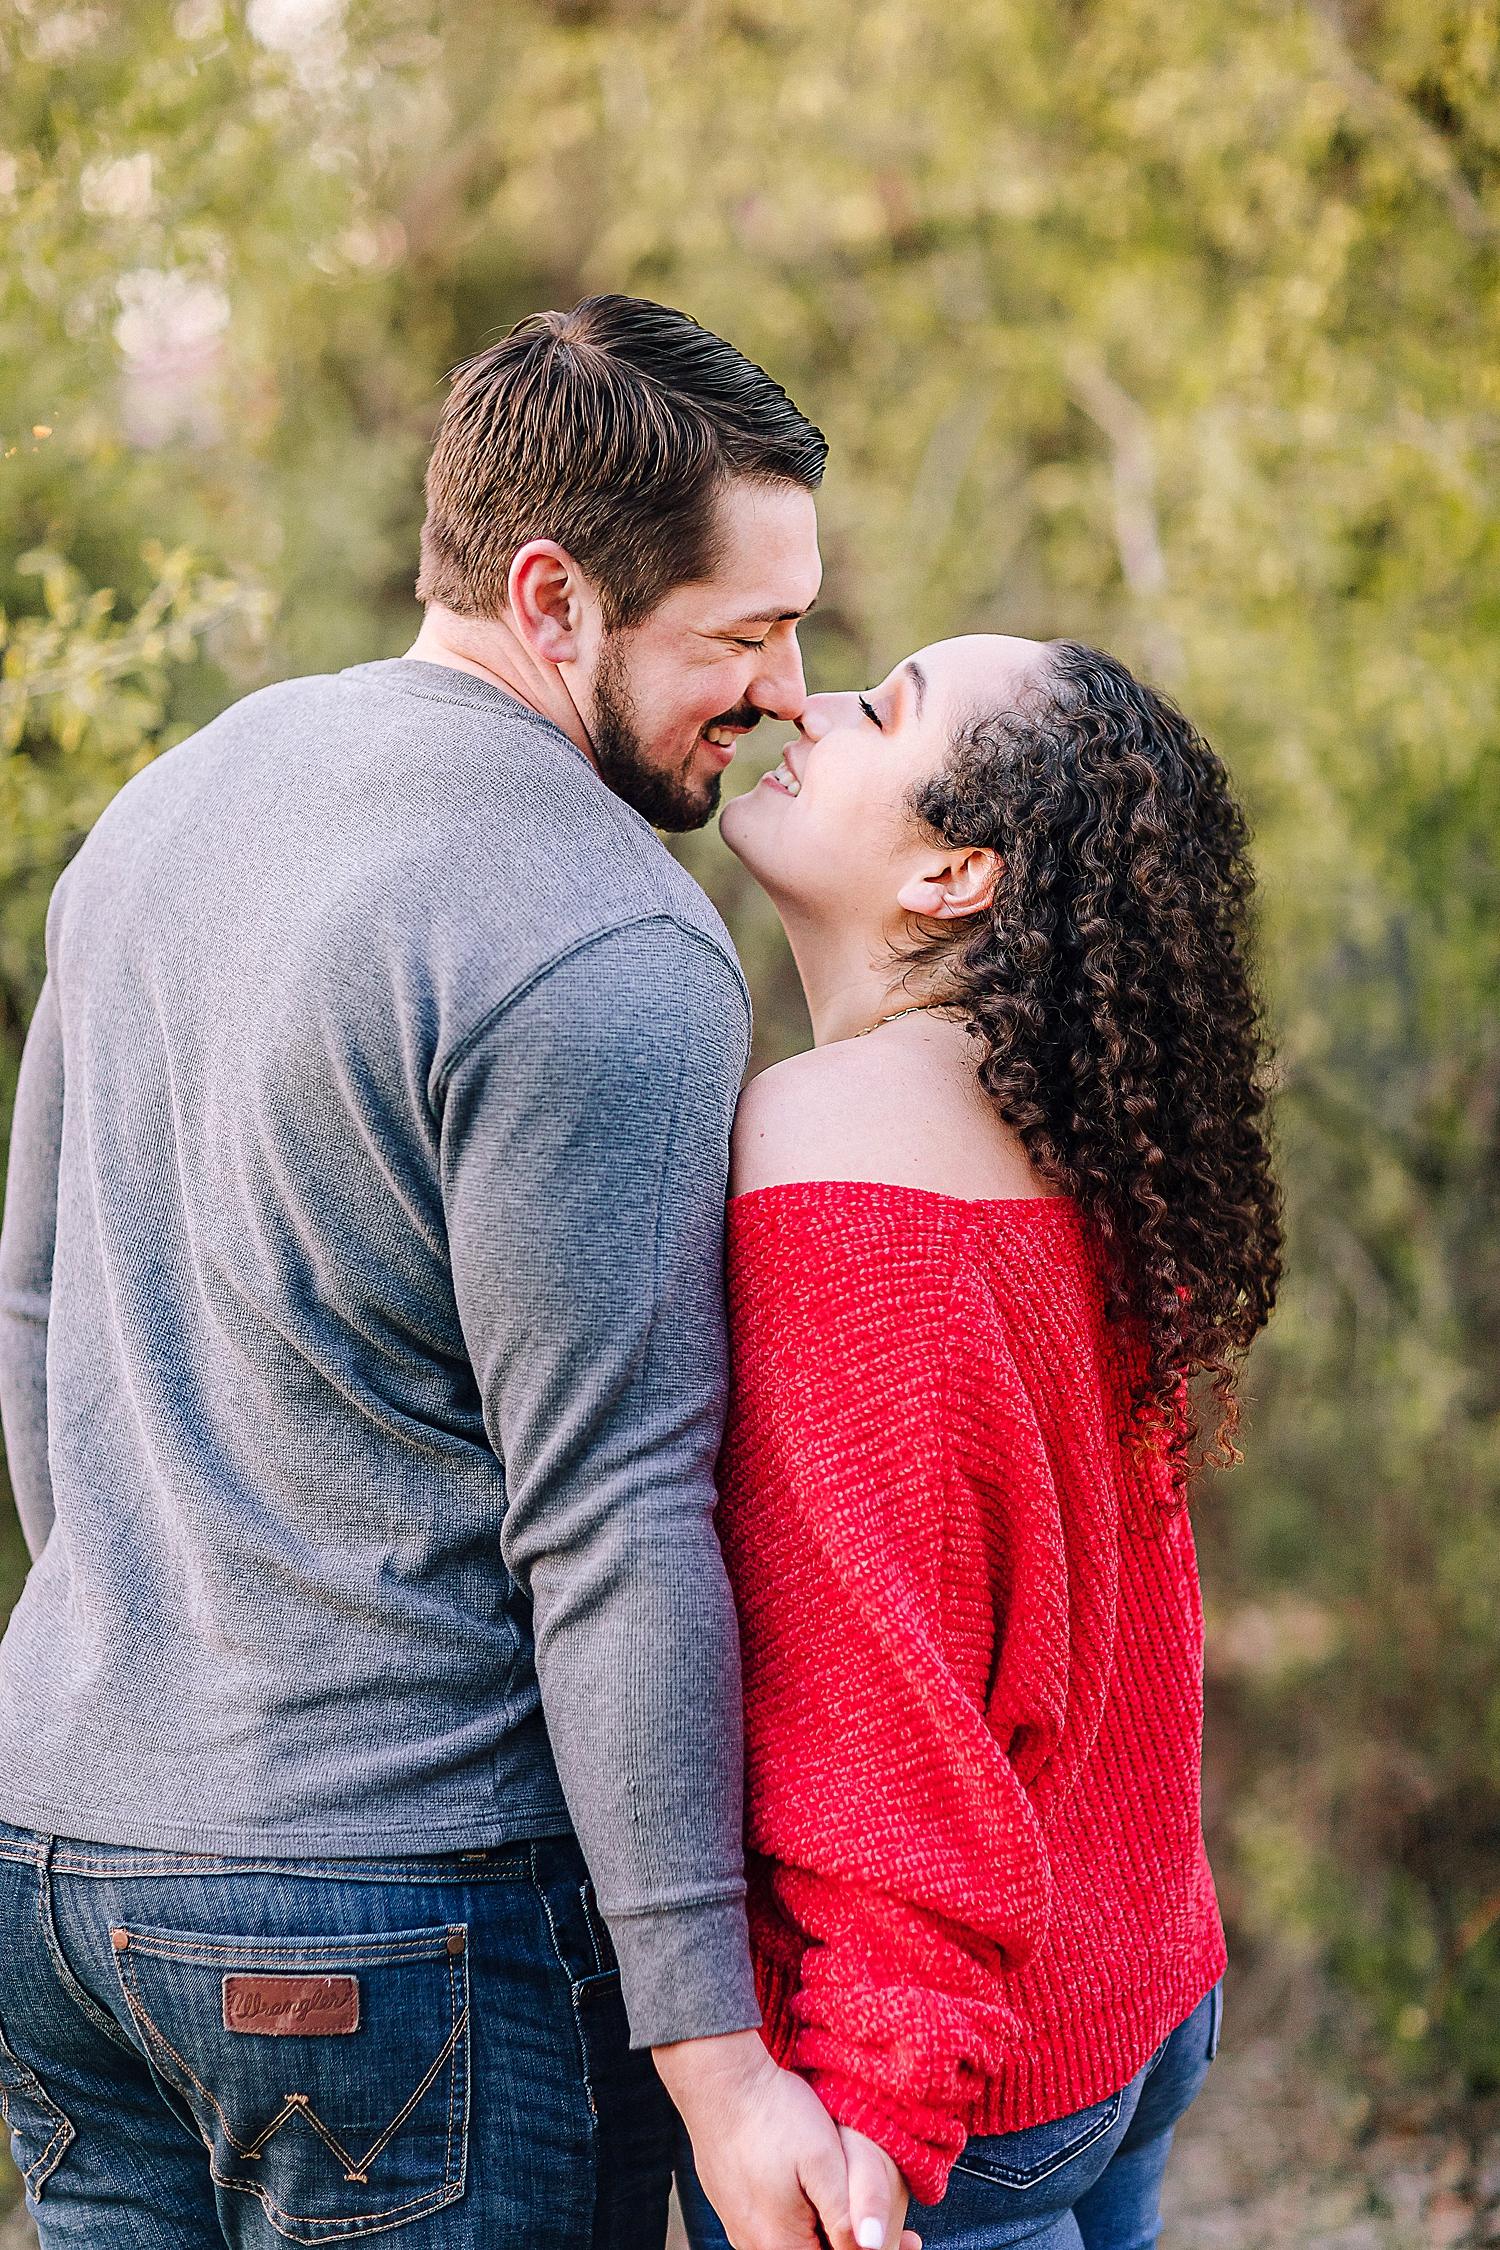 Engagement-photo-session-gruene-new-braunfels-texas-carly-barton-photography_0018.jpg